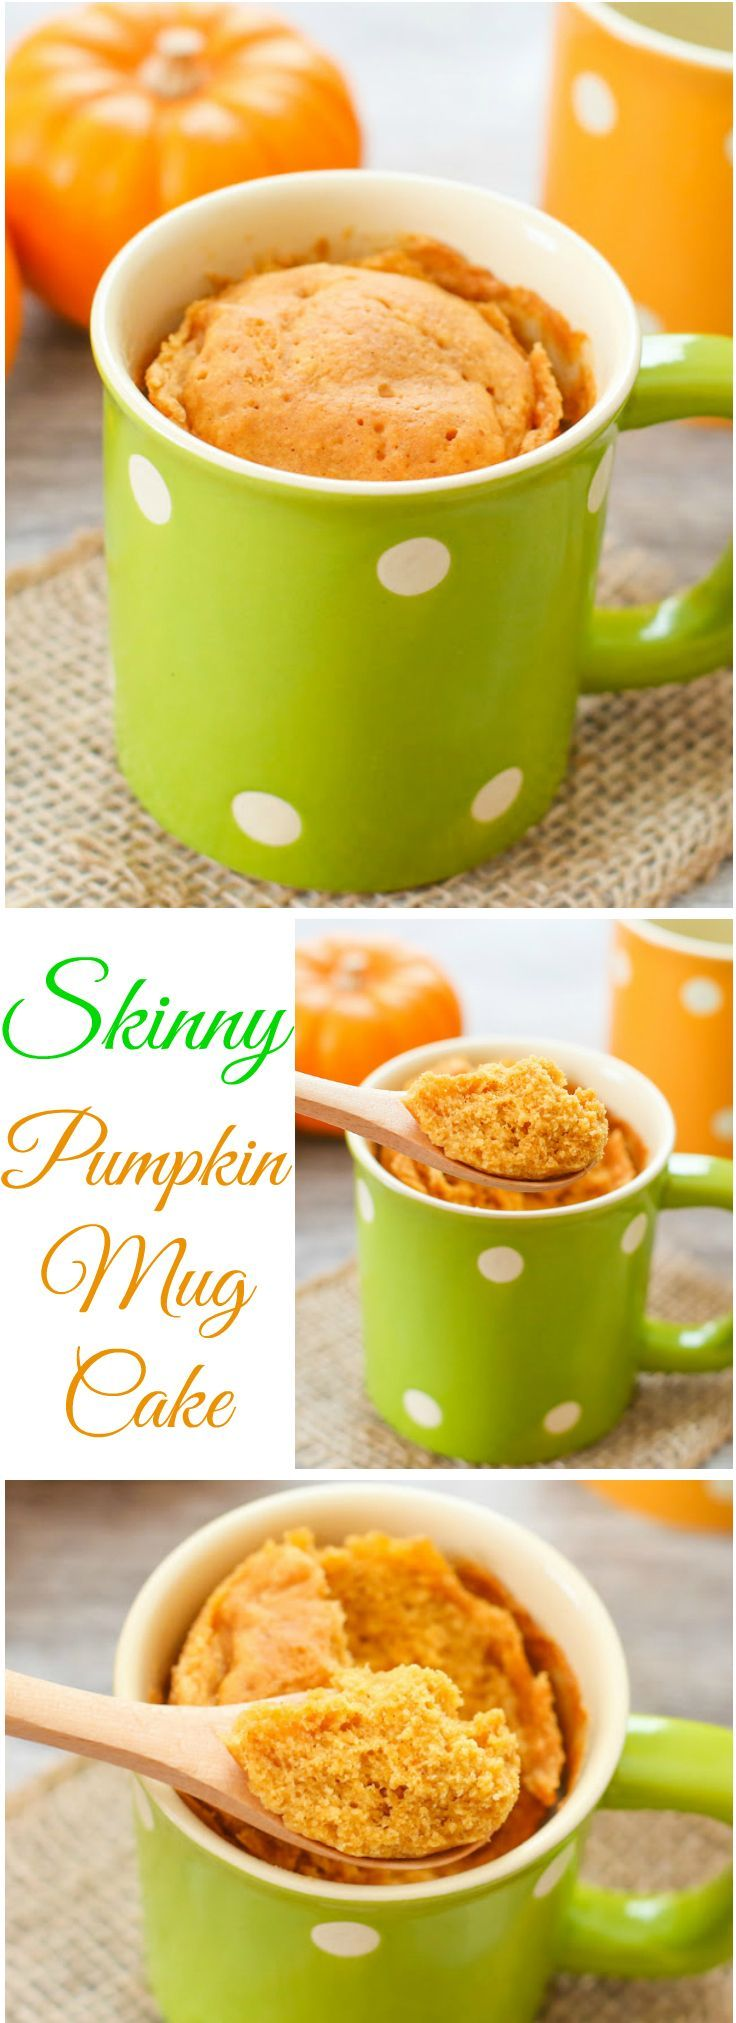 Skinny Pumpkin Mug Cake. Only 190 calories!